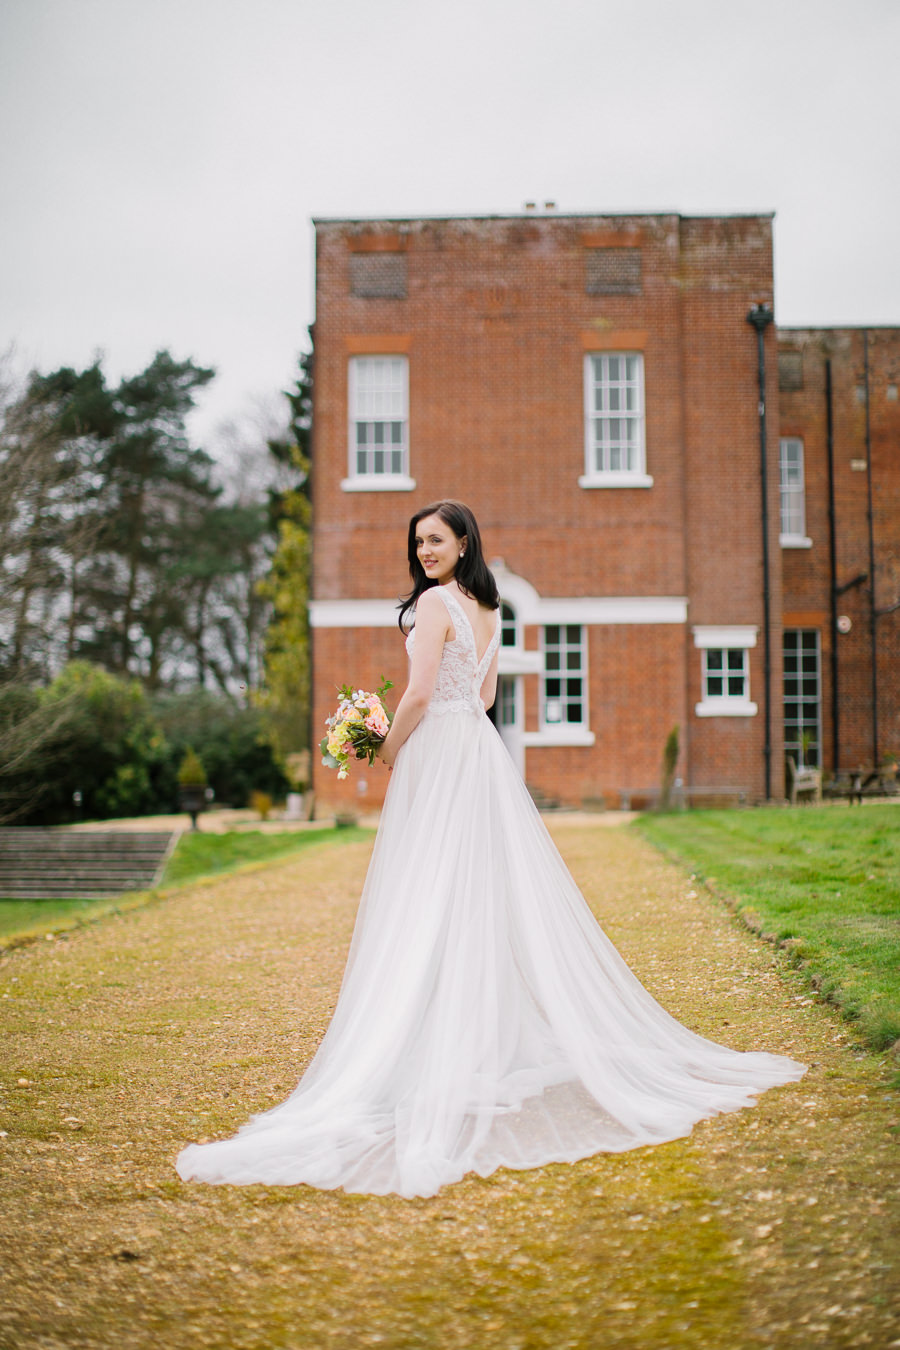 'Understated Elegance' Spring Styled Hampshire Bridal Shoot – Rownhams House, photo credit Nisha Haq Photography (13)